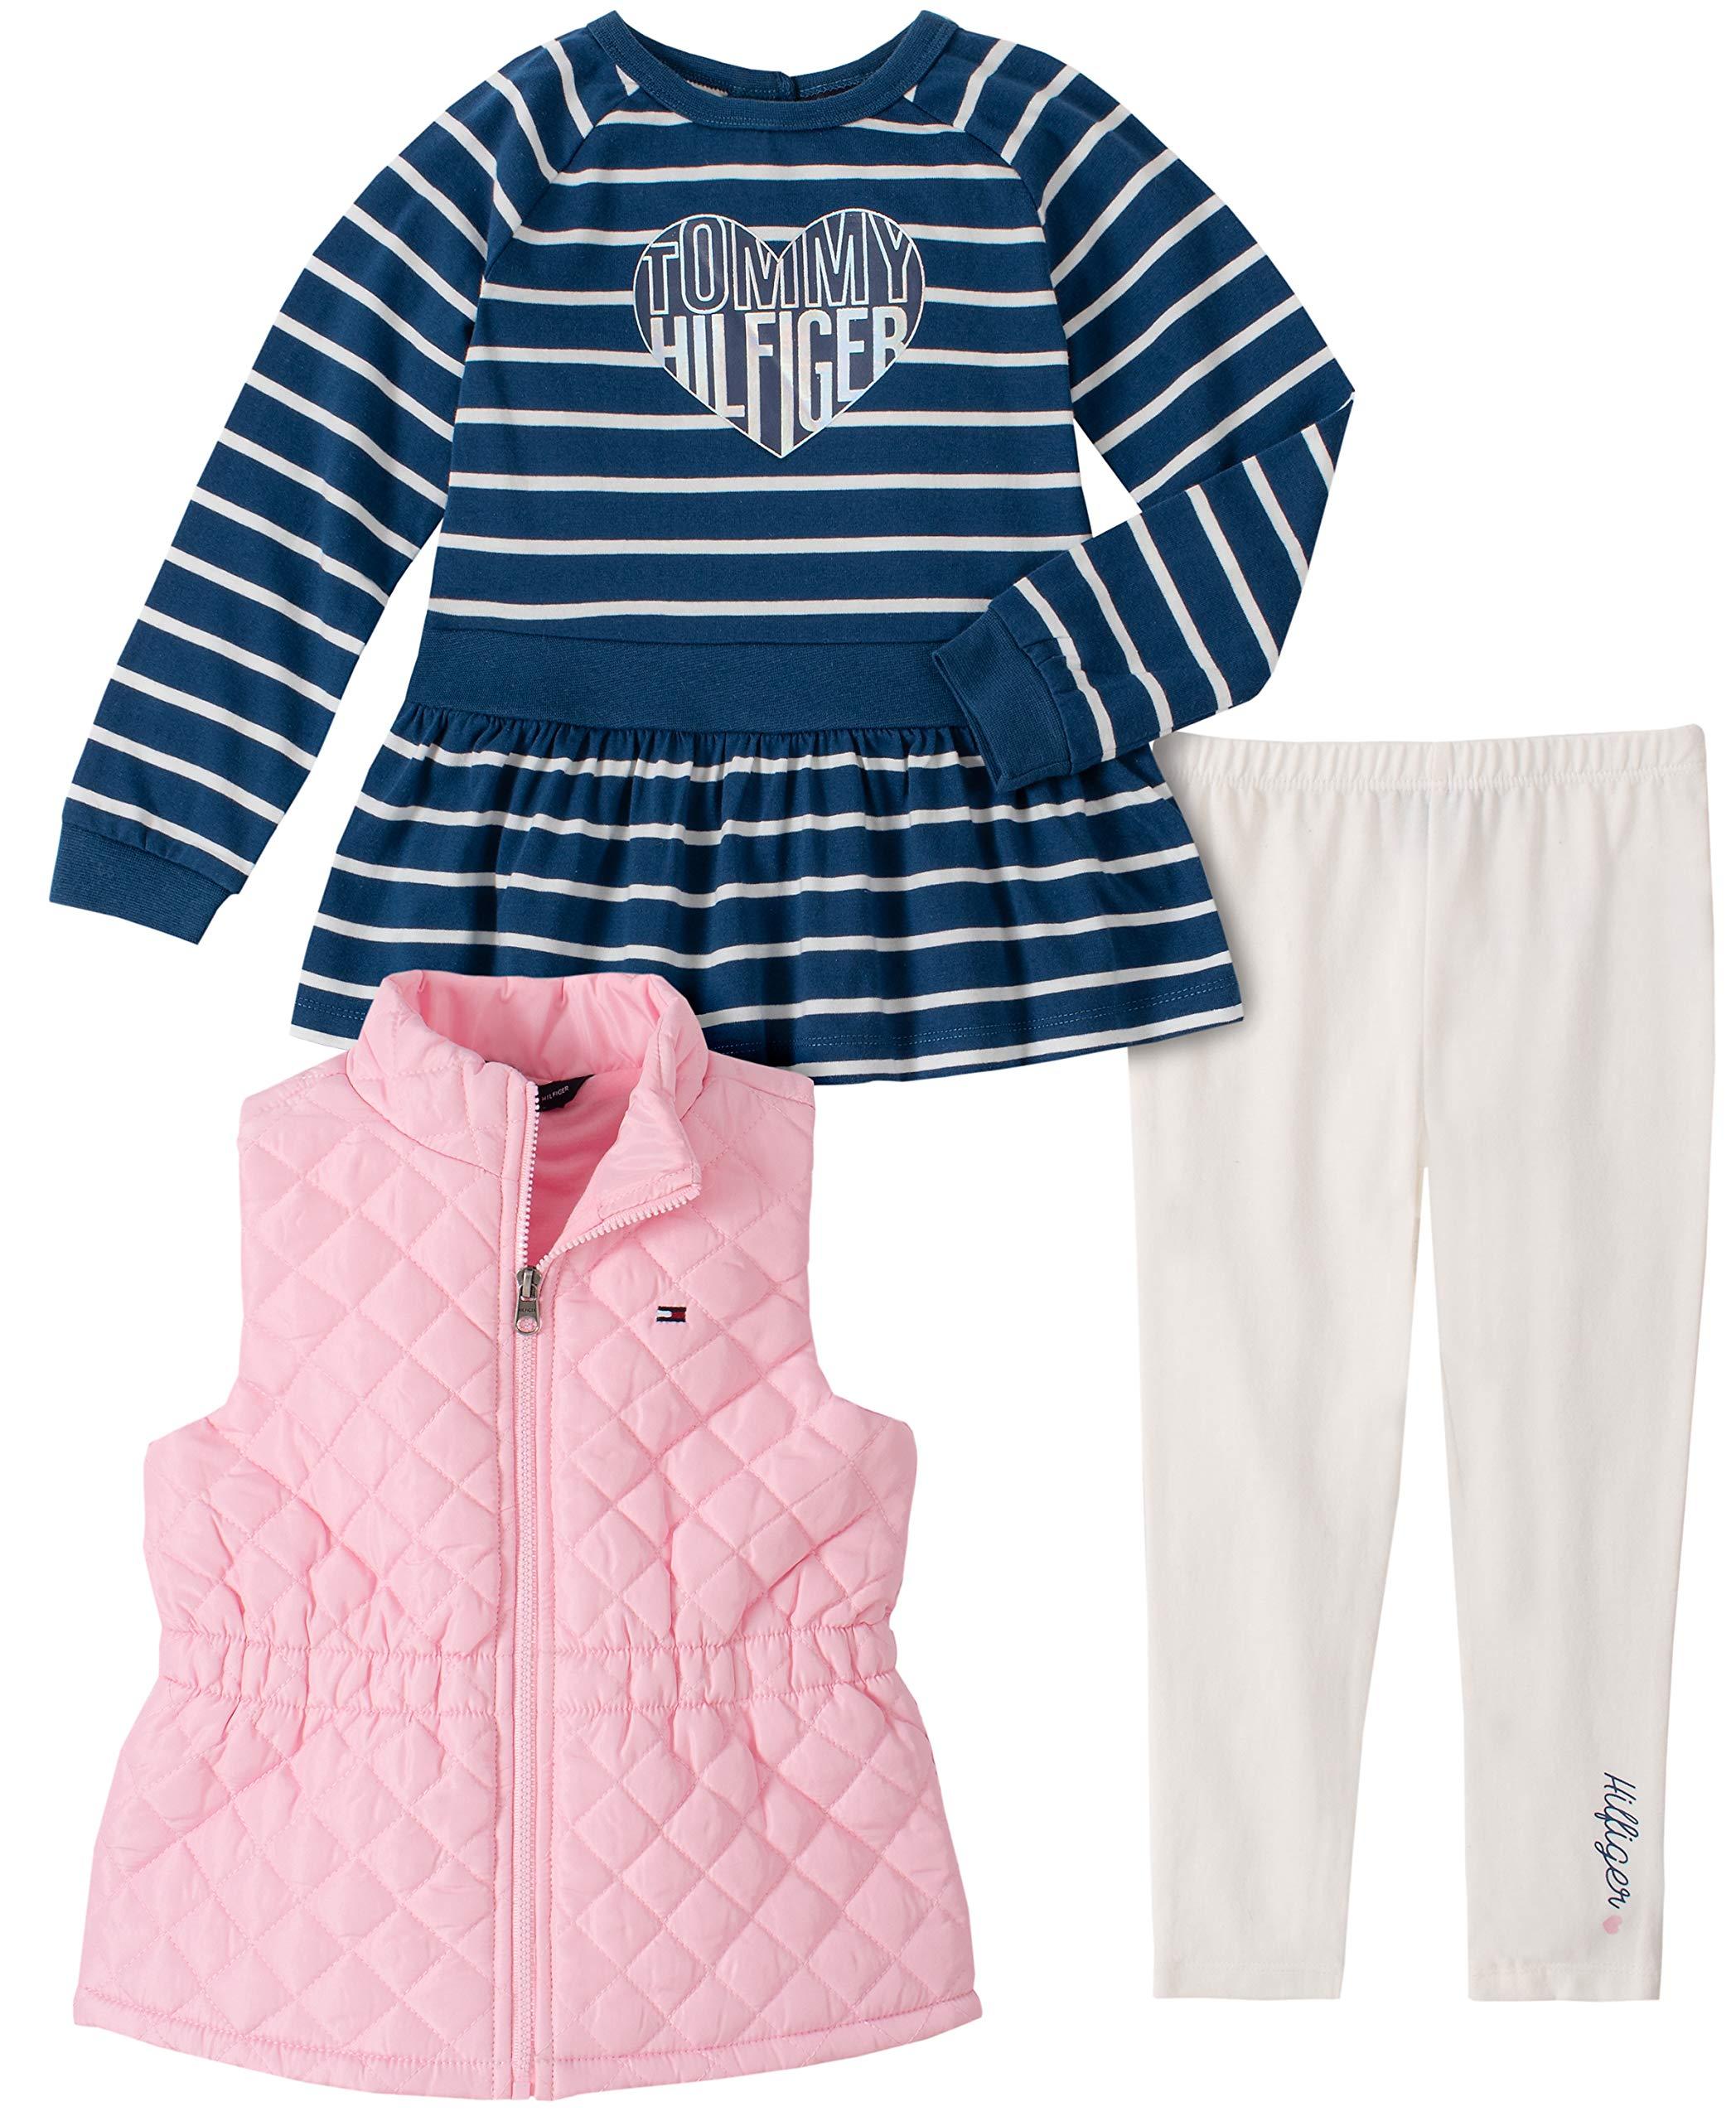 Tommy Hilfiger Baby Girls' 3 Pieces Vest Pants Set